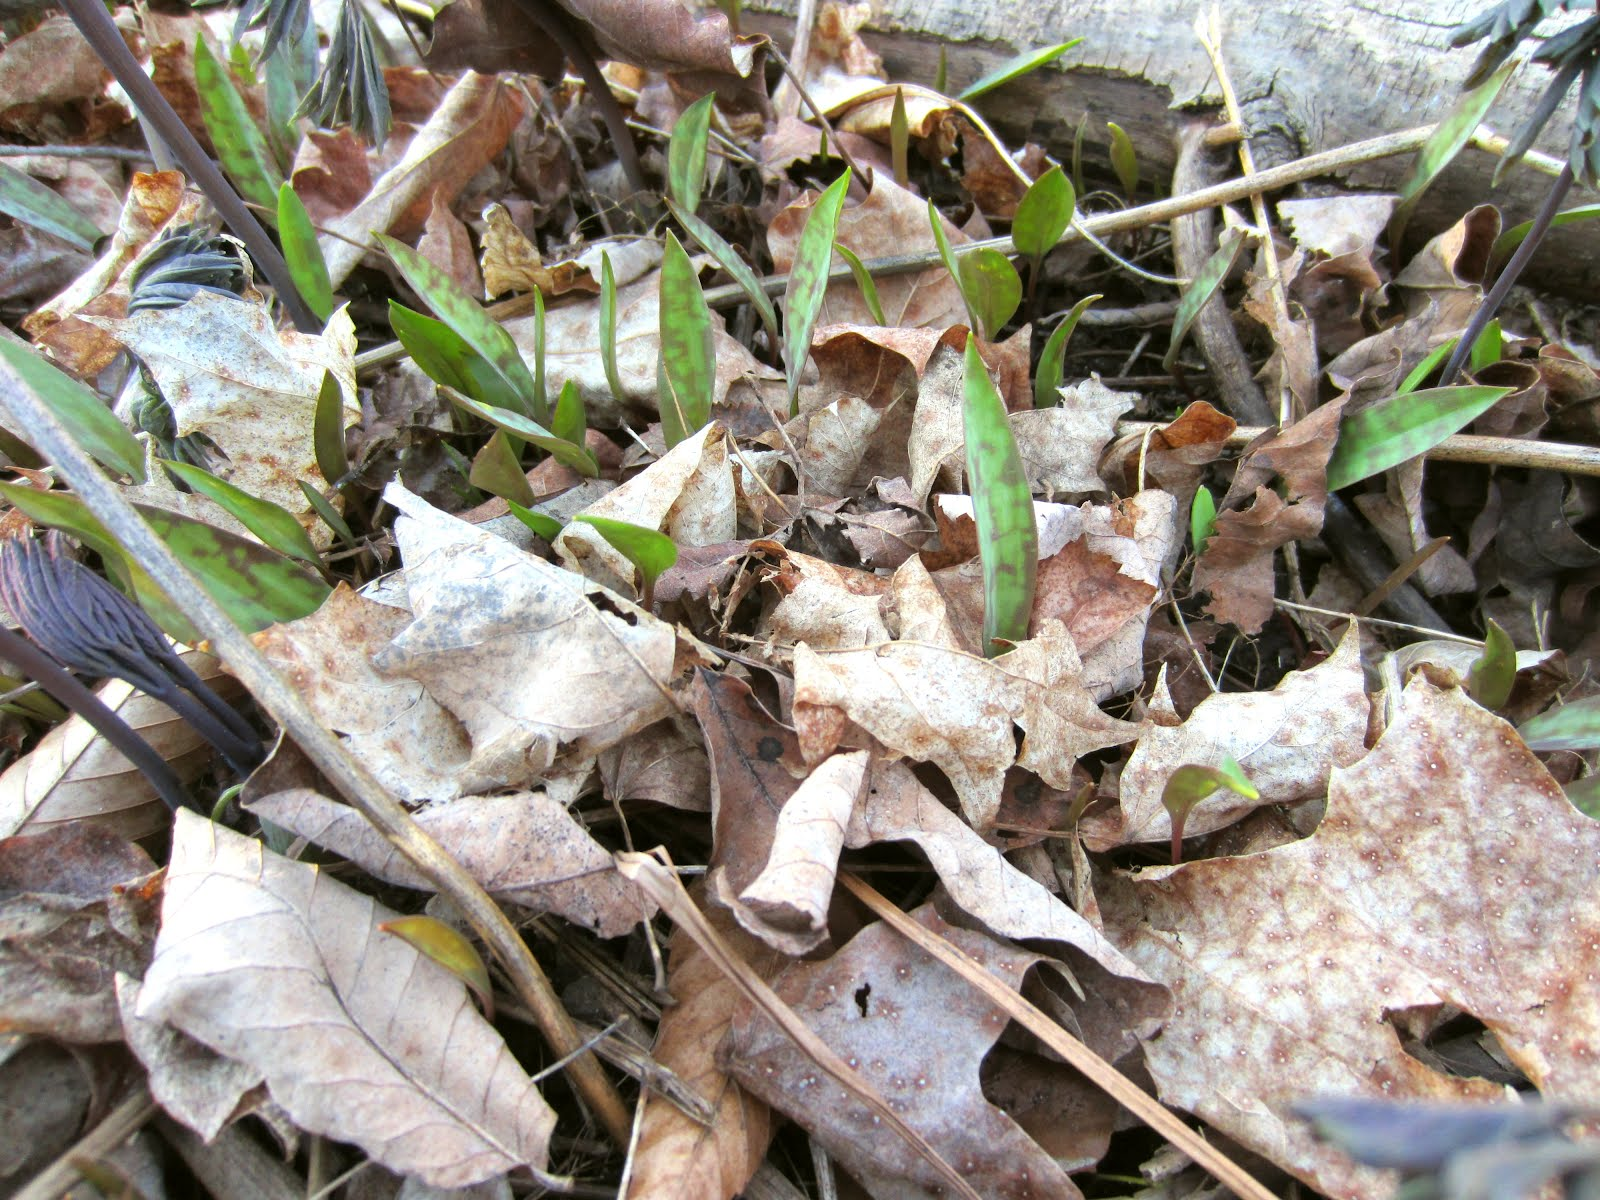 Unstuffed Easter Lilies